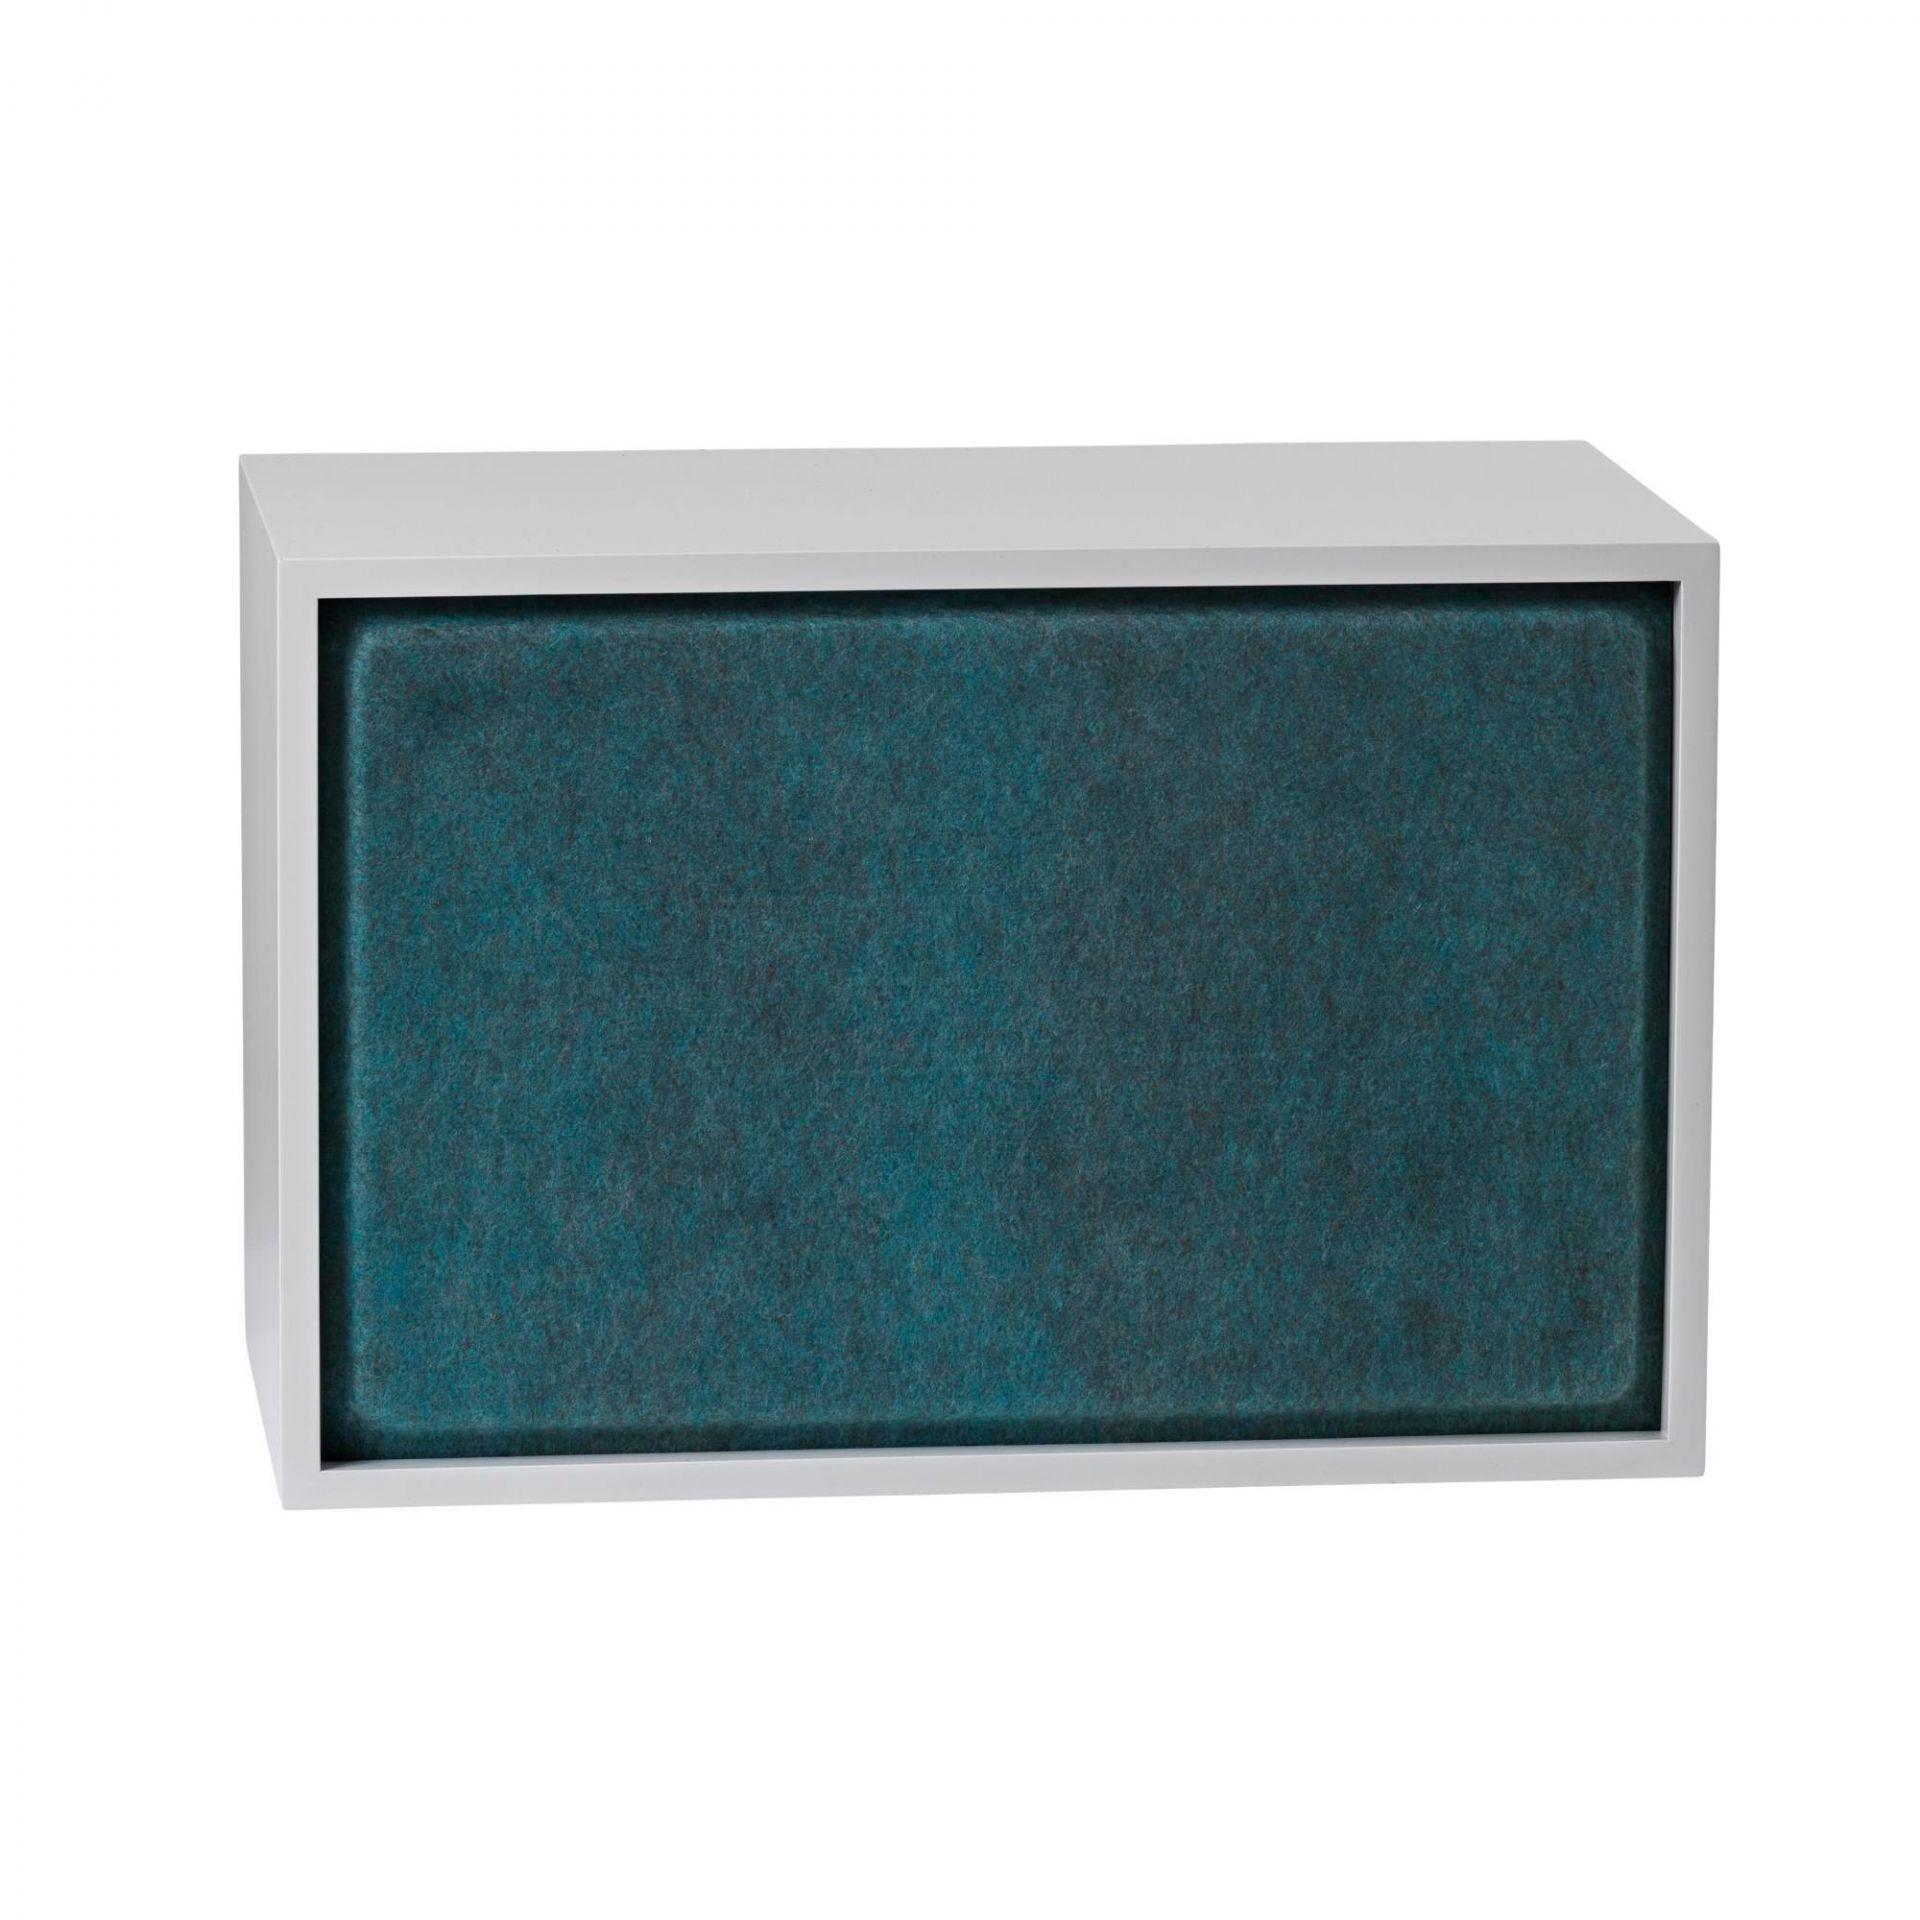 Acoustic Panel für Stacked Regalsystem groß Muuto-Grau melange